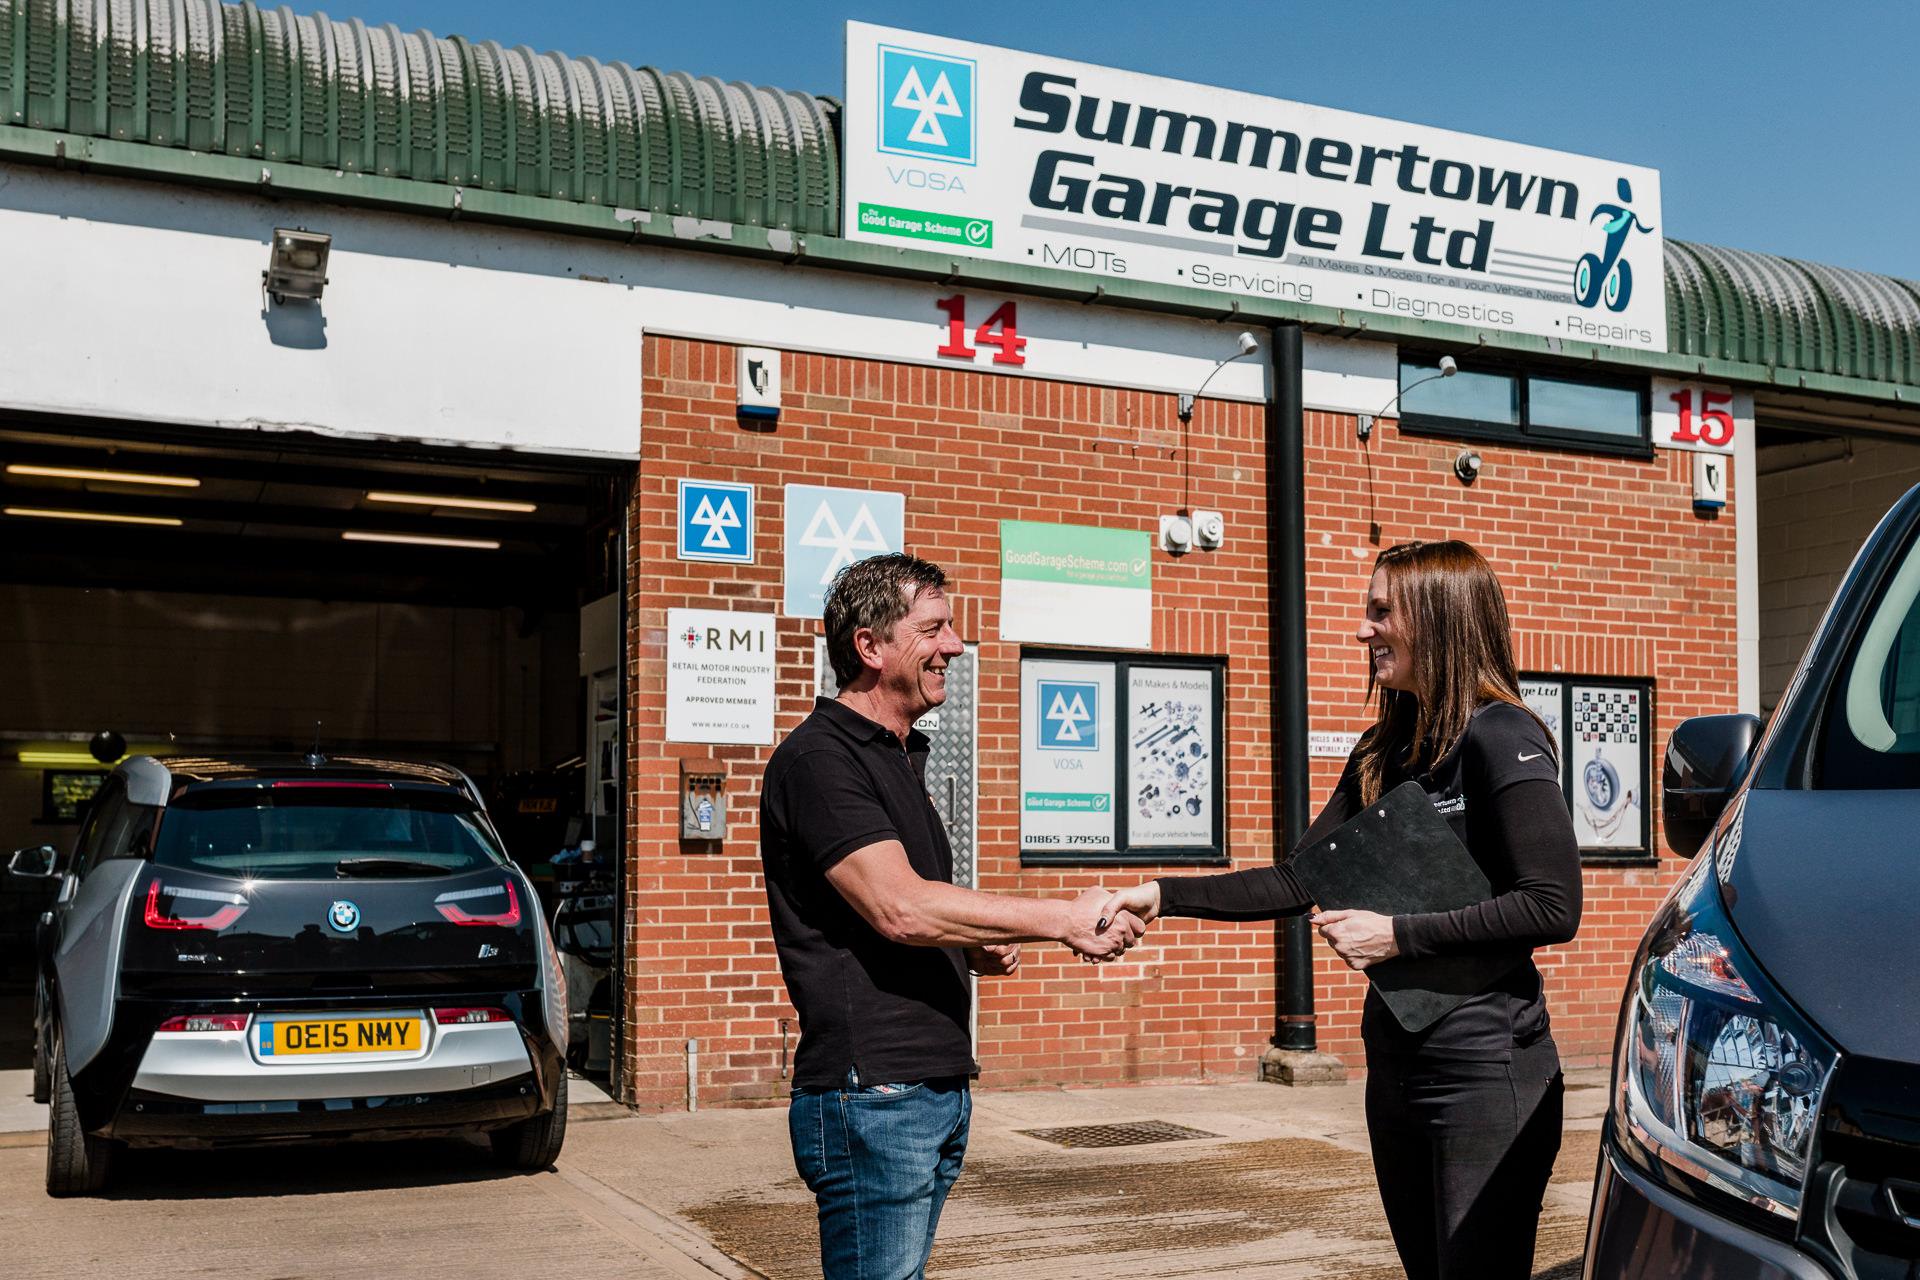 professional commercial PR business lifestyle photographer Summertown Garage Kidlington